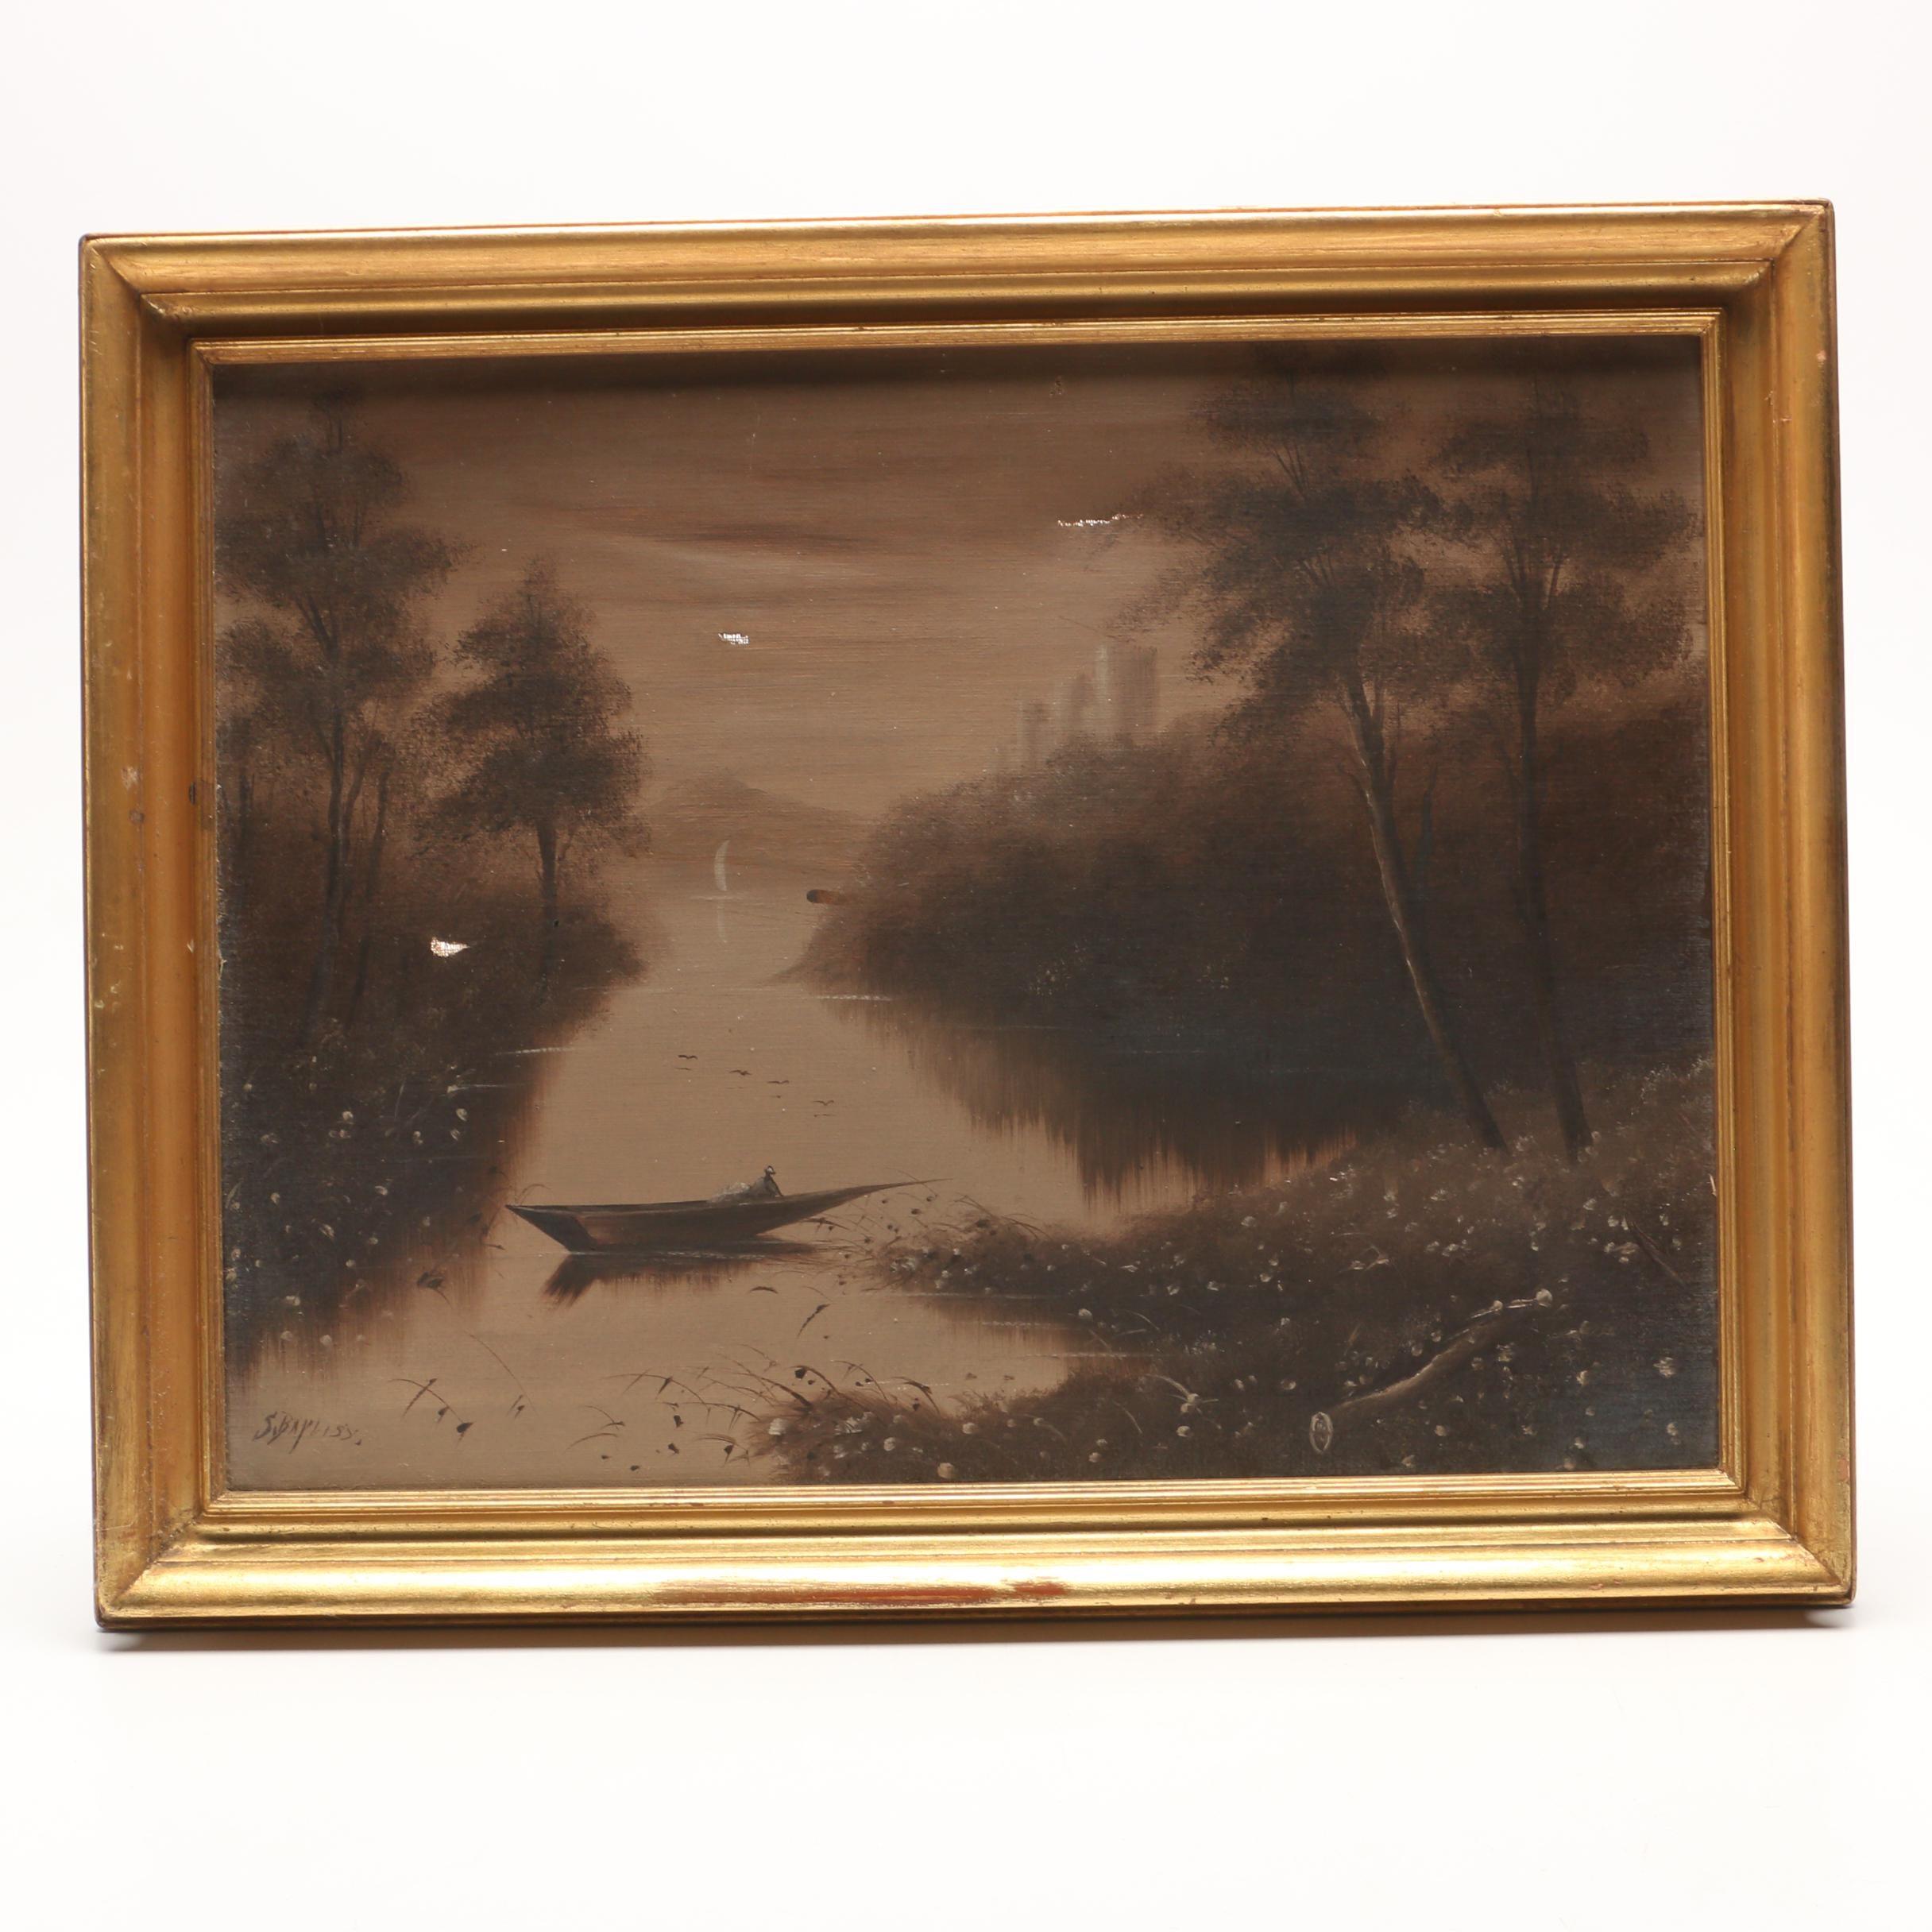 S. Bayliss Landscape Oil Painting